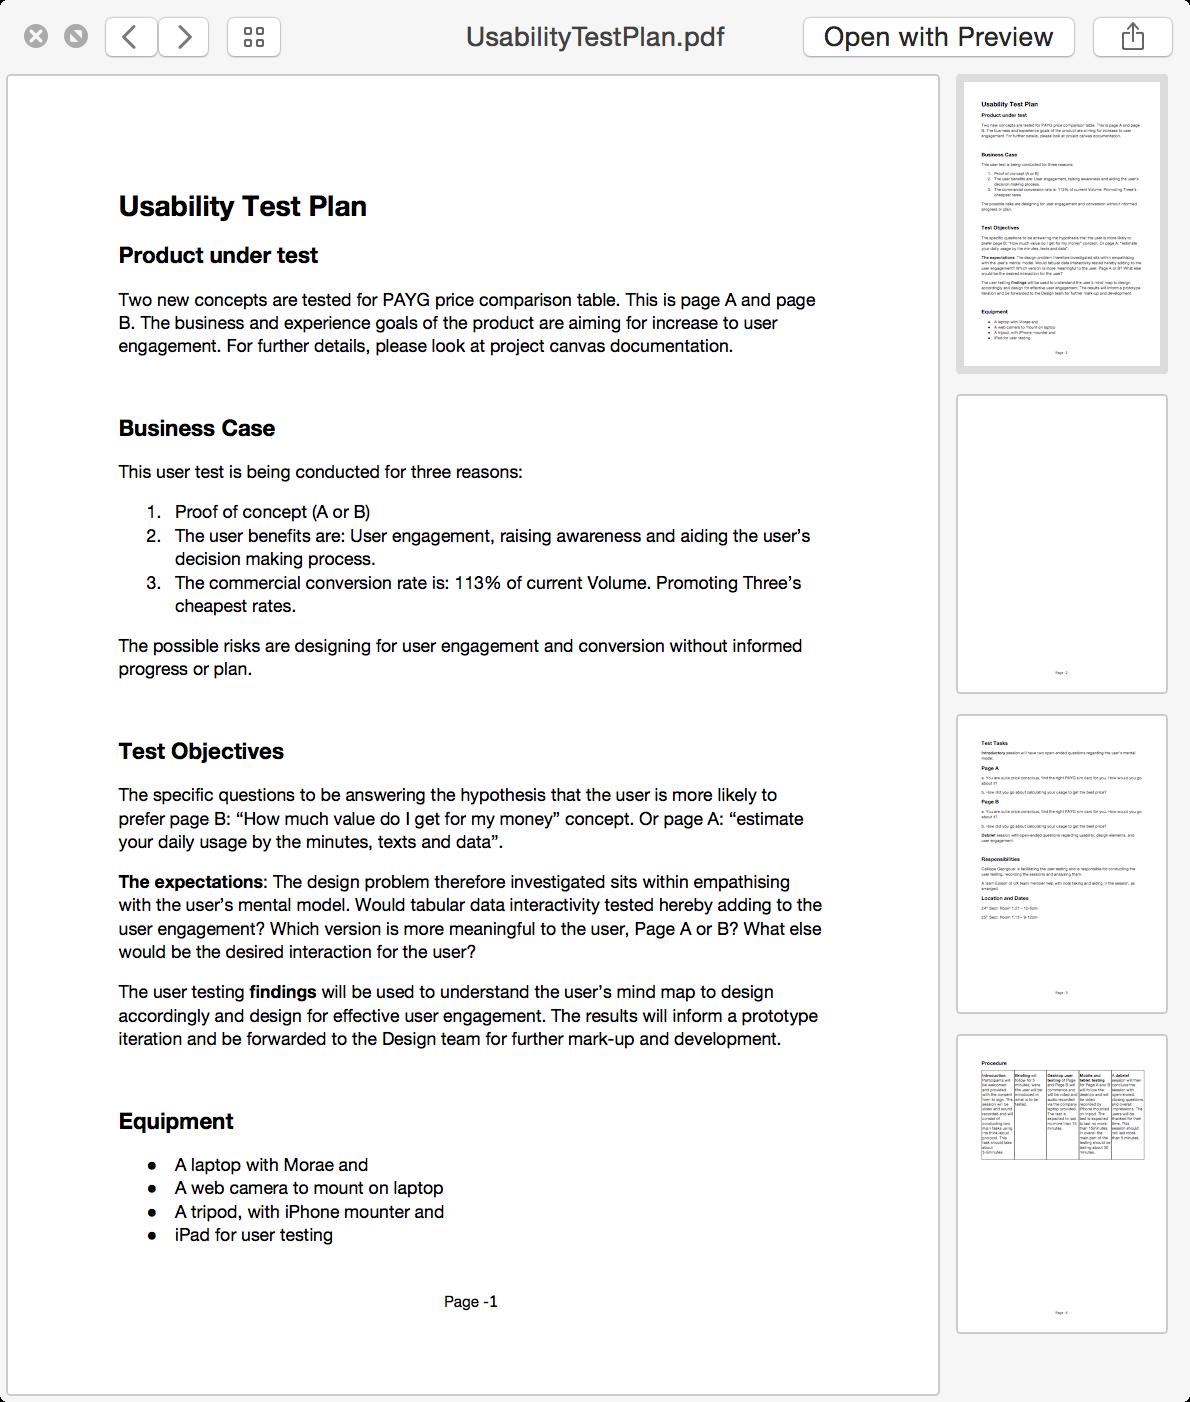 9 usability testing plan.png